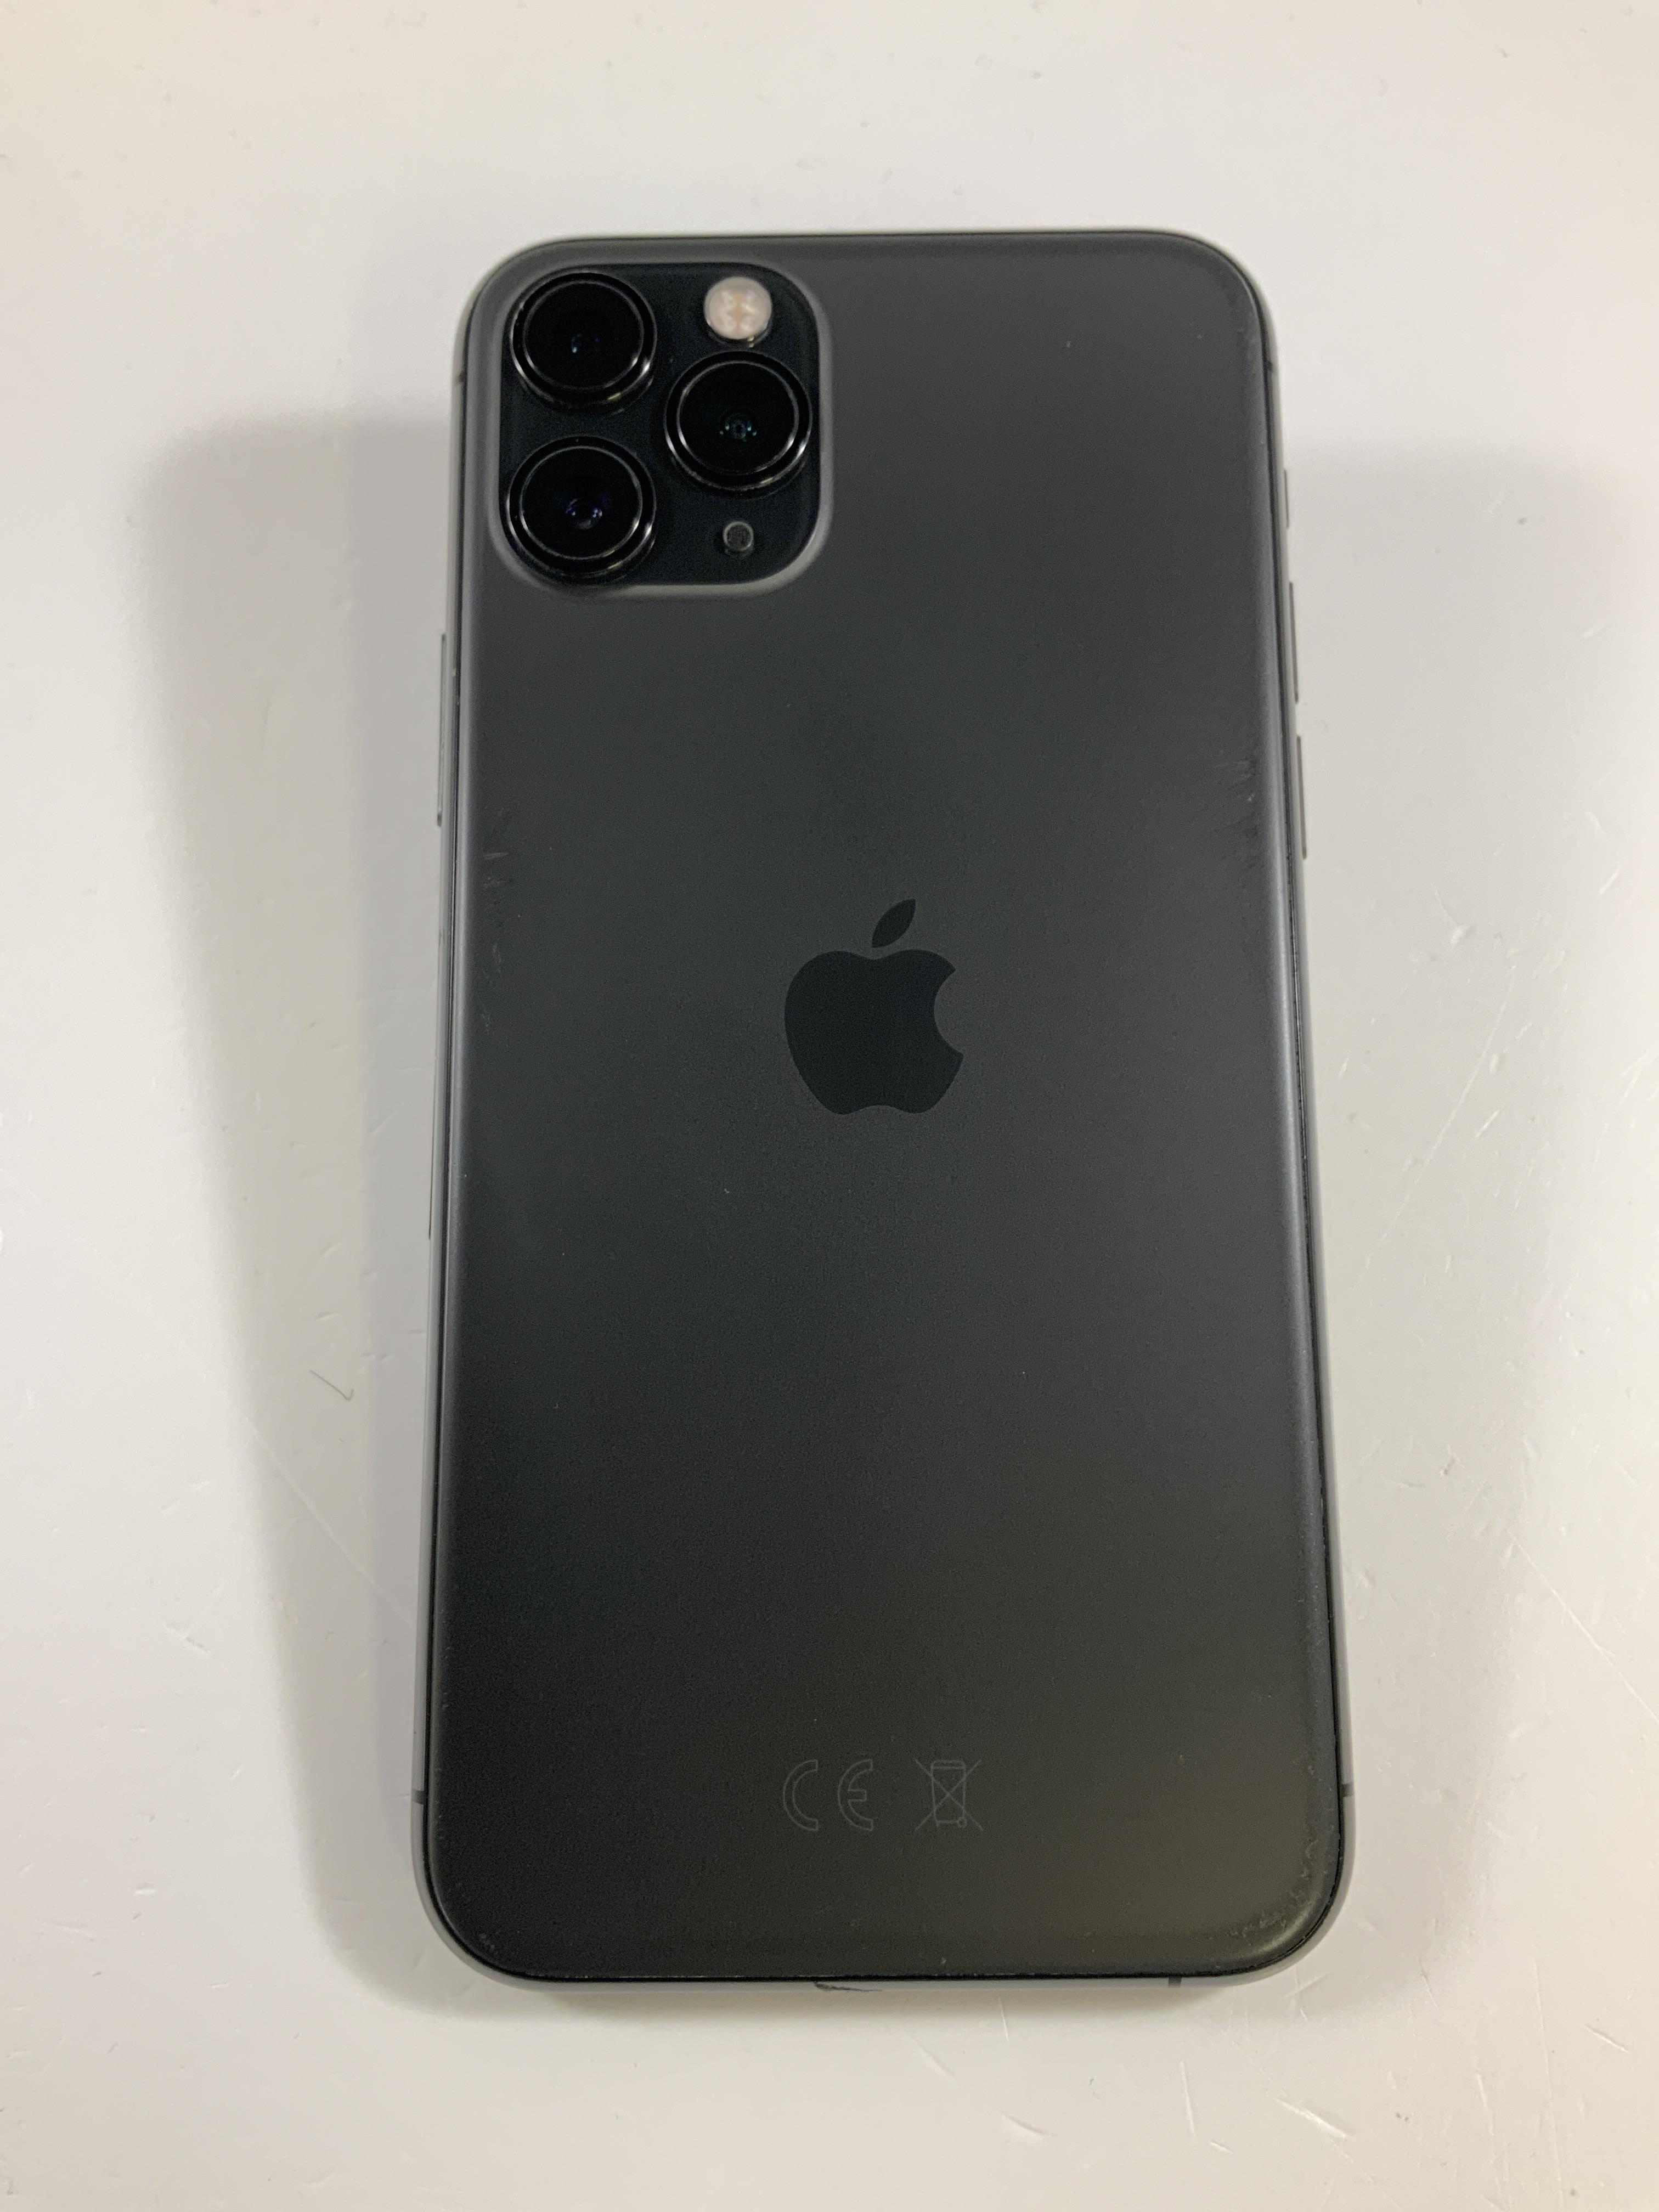 iPhone 11 Pro 64GB, 64GB, Space Gray, bild 2